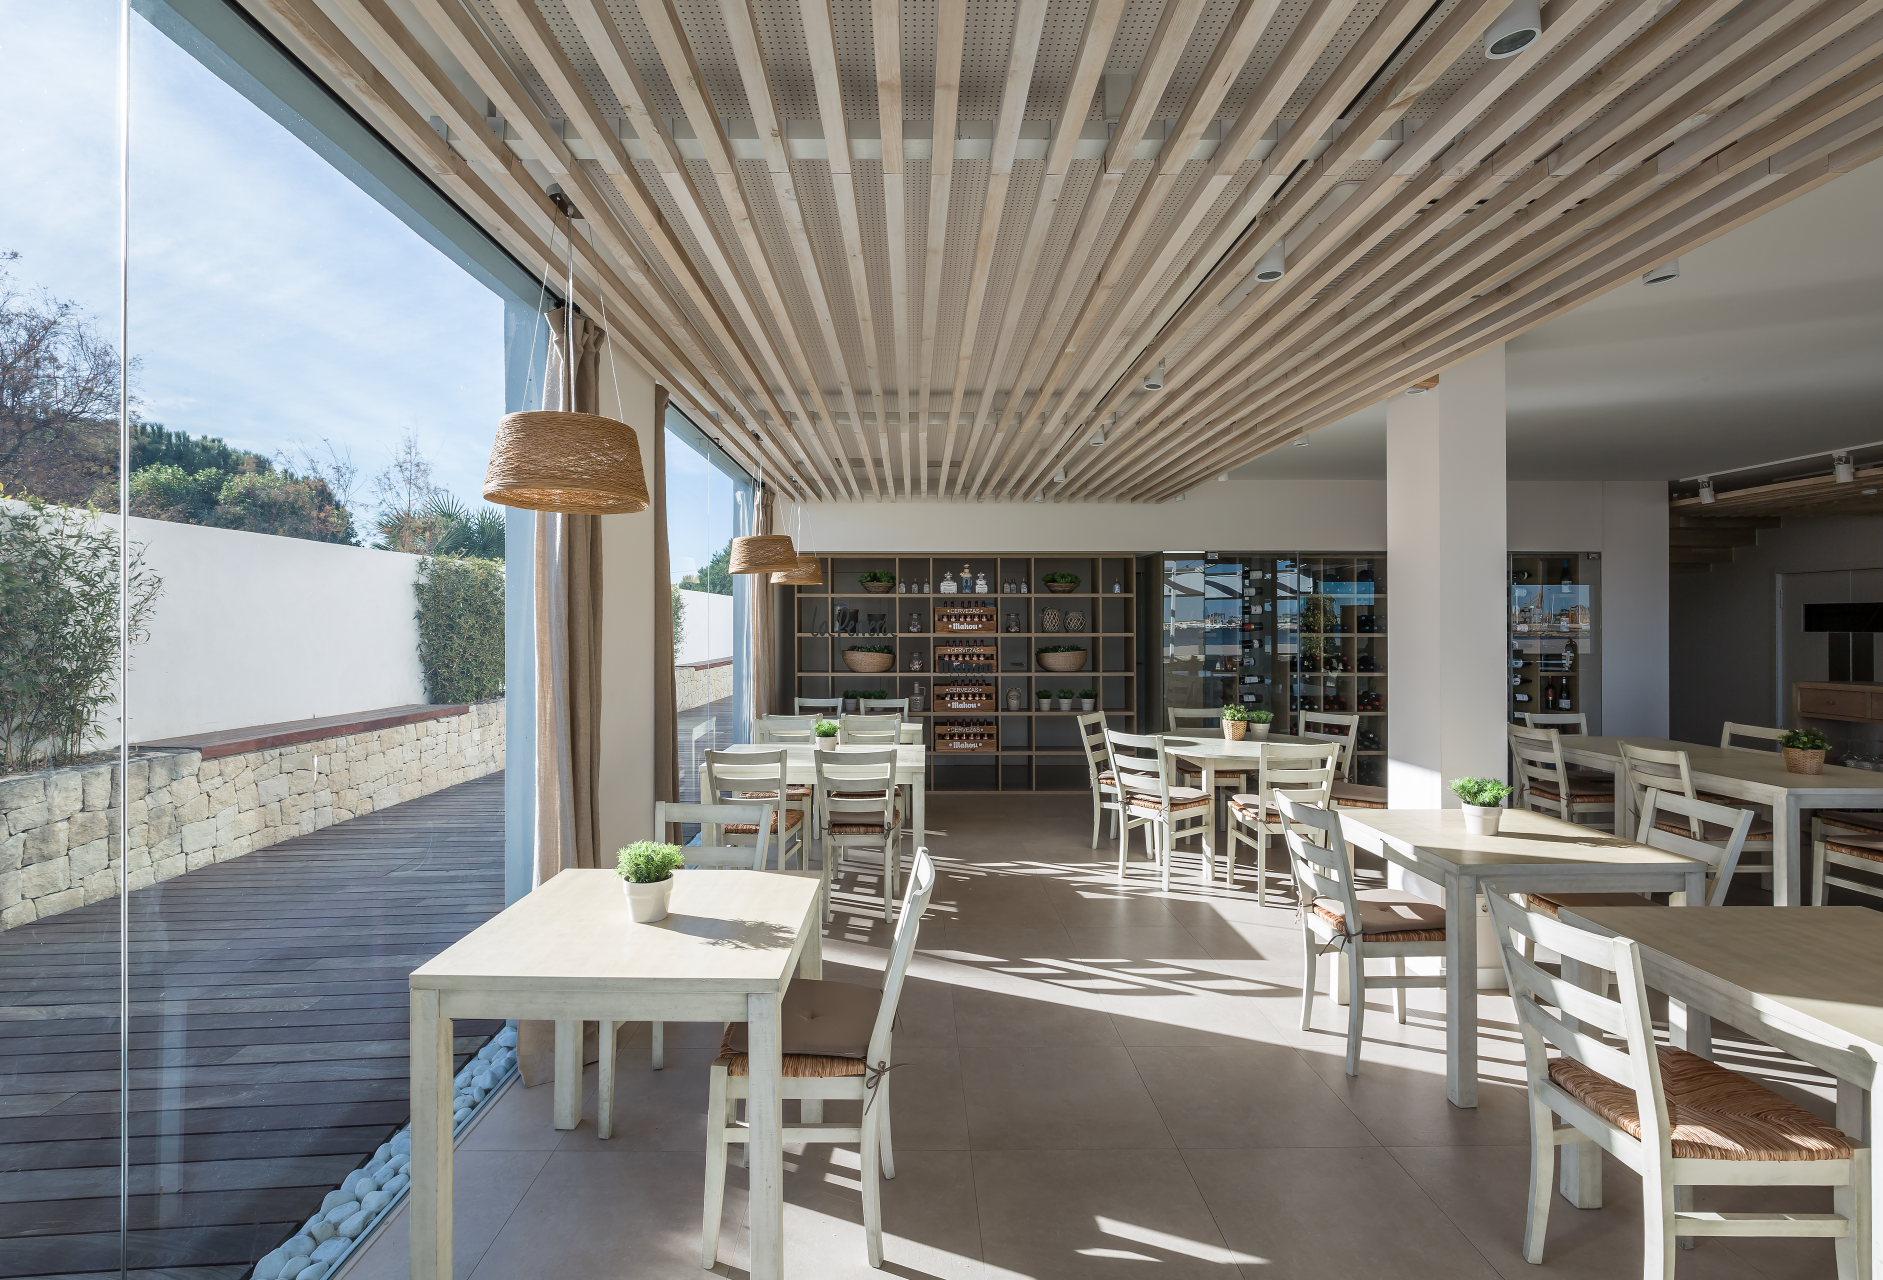 fotografia-arquitectura-valencia-german-cabo-versea-restaurante-ferrera-pinedo (13)